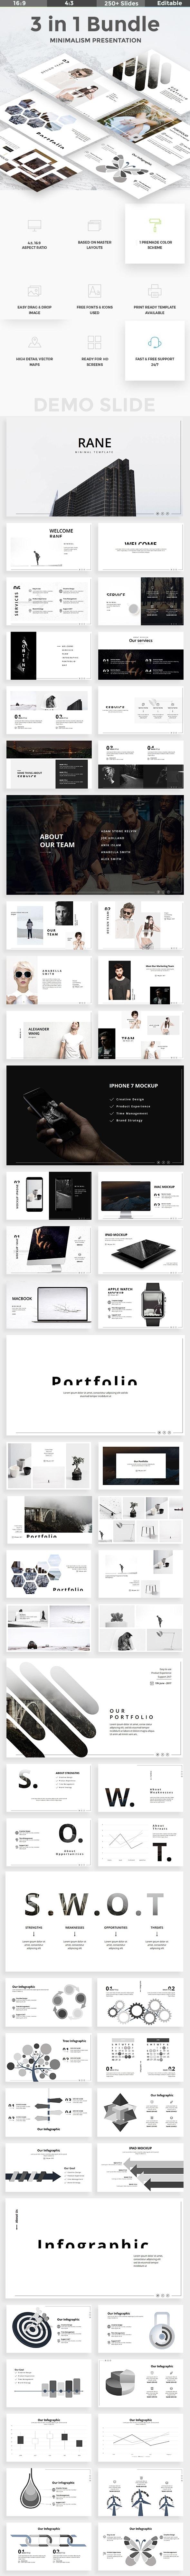 Minimal Bundle - 3 in 1 Powerpoint Template - Creative PowerPoint Templates